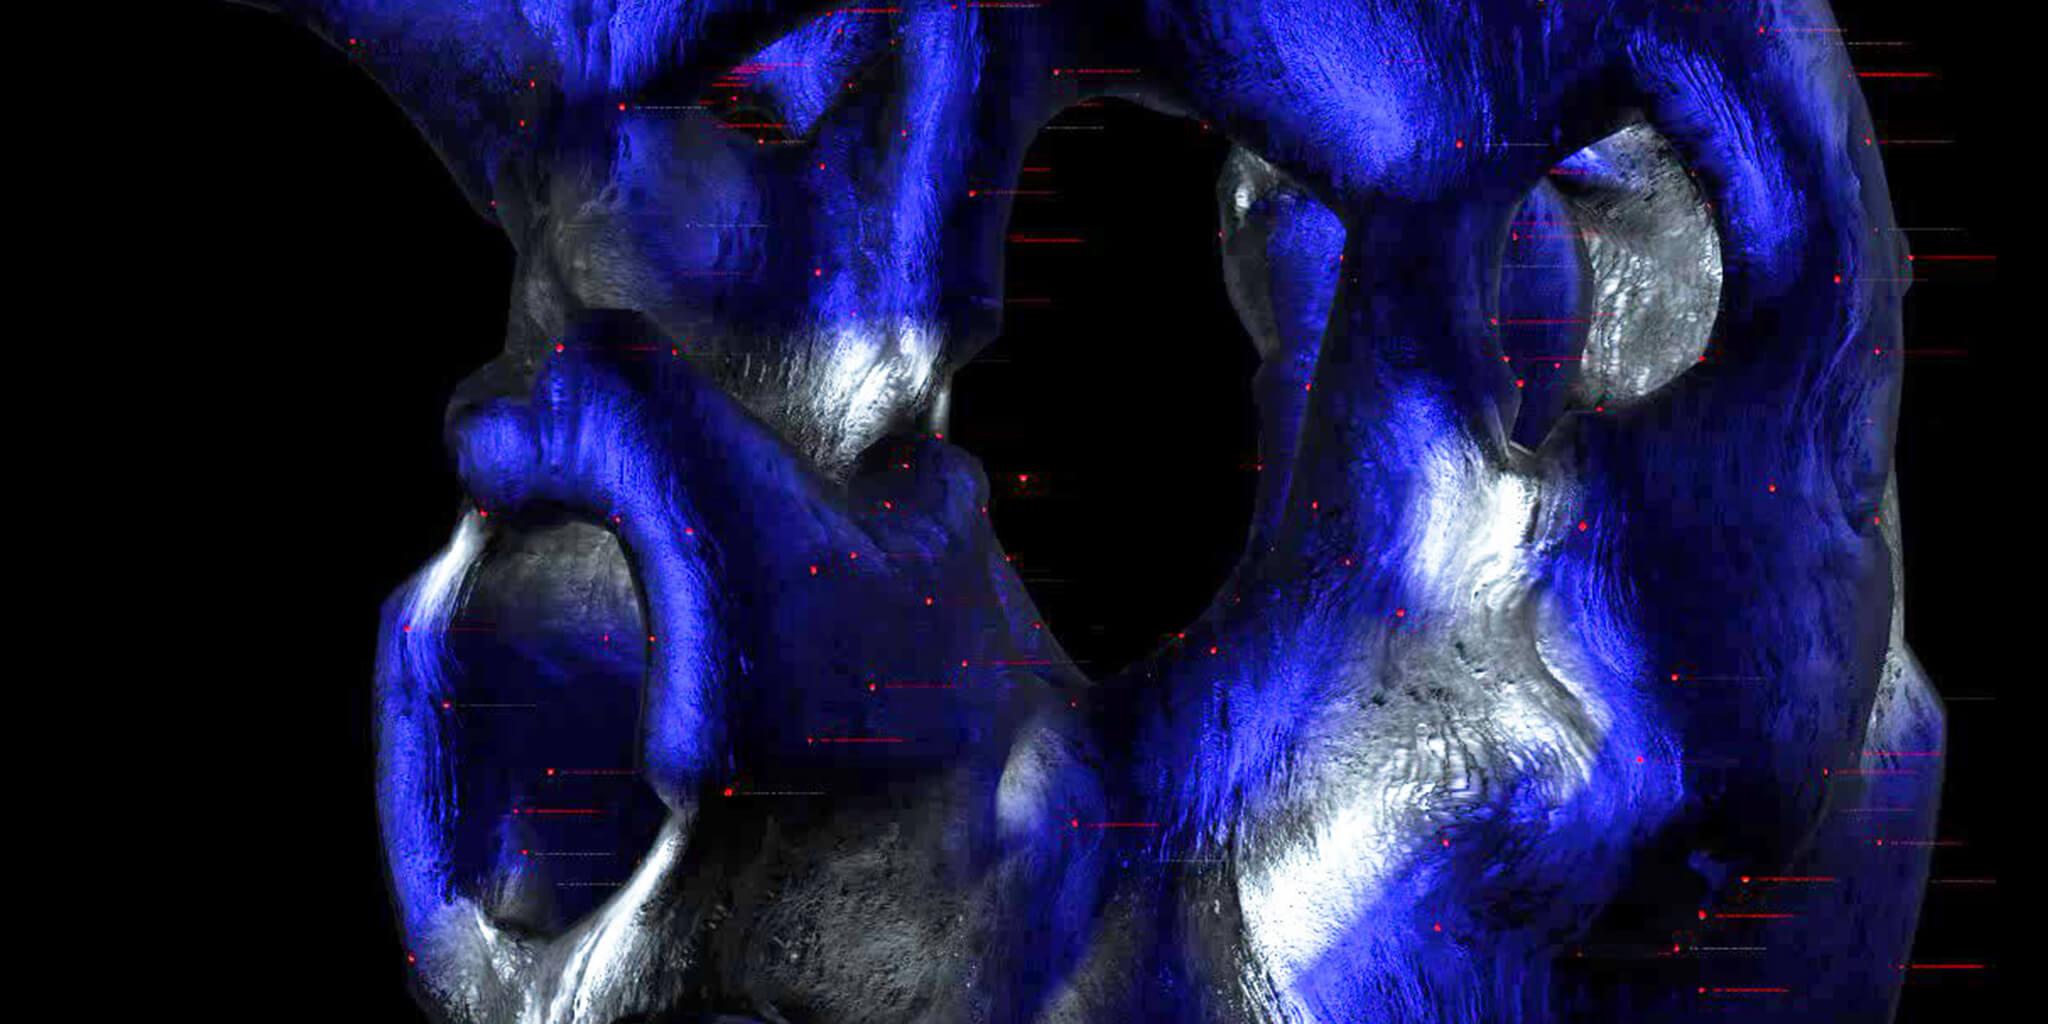 Andrea Reni - Psycotropic topologies